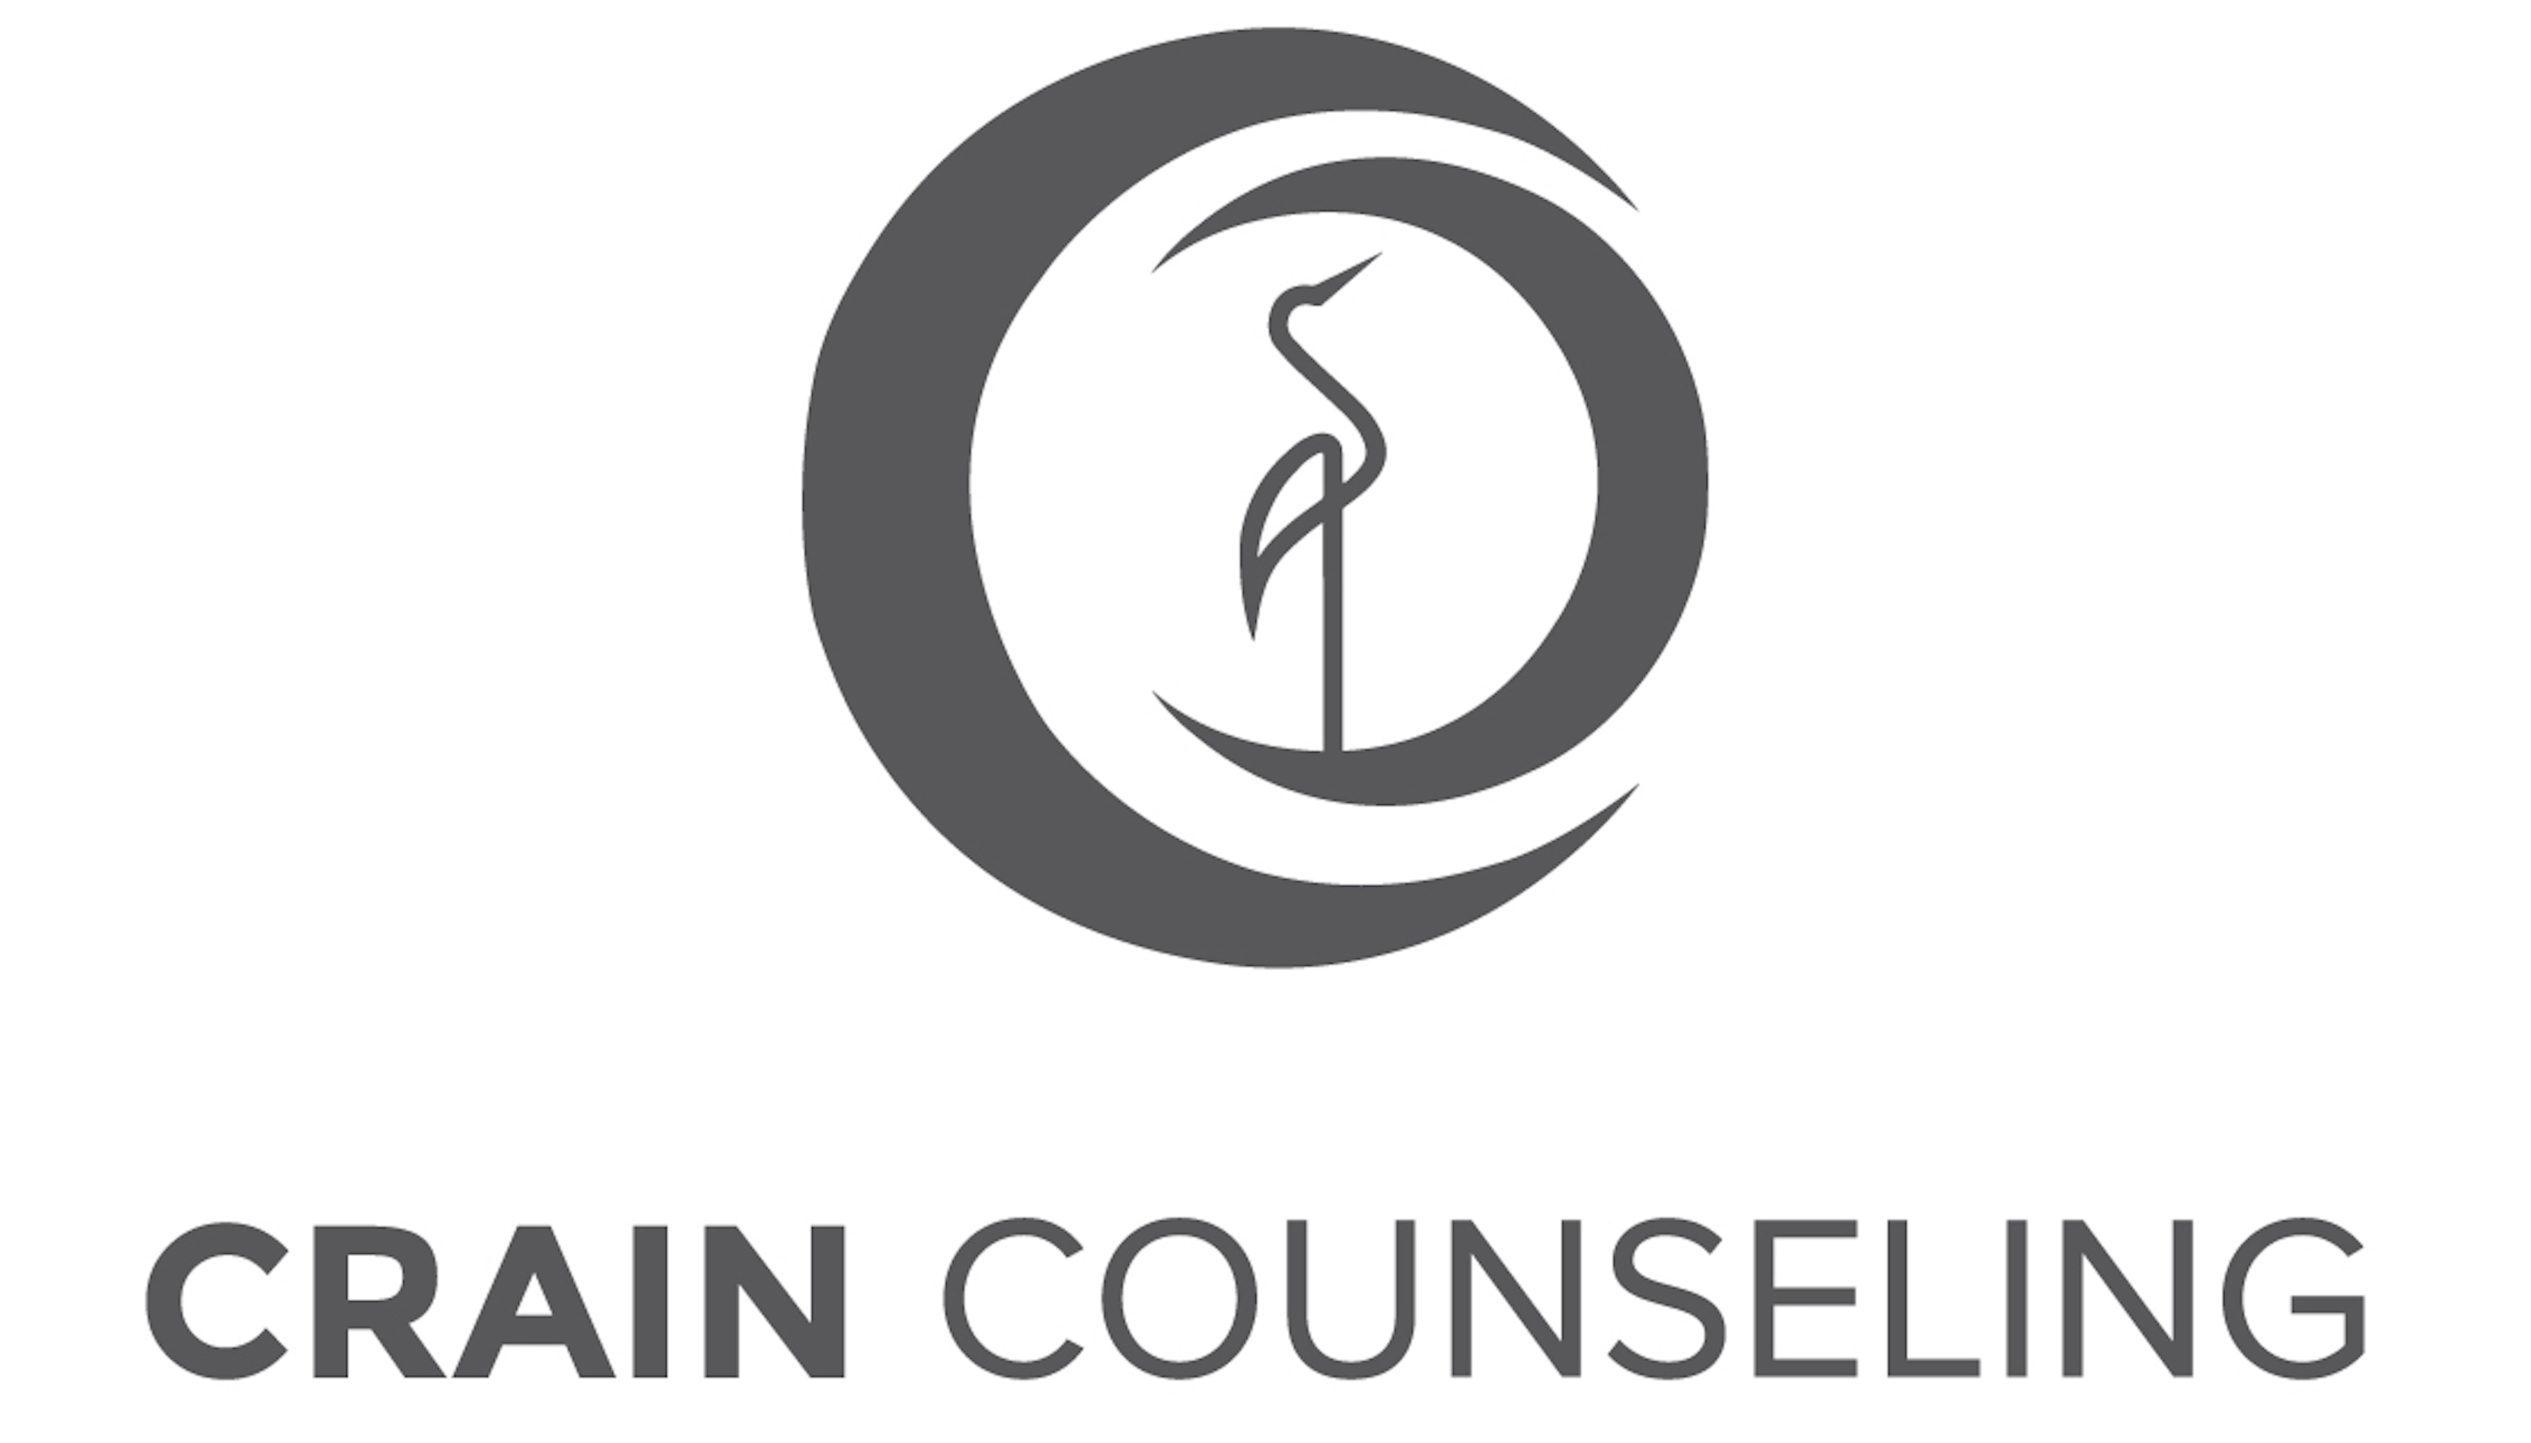 Crain Counseling